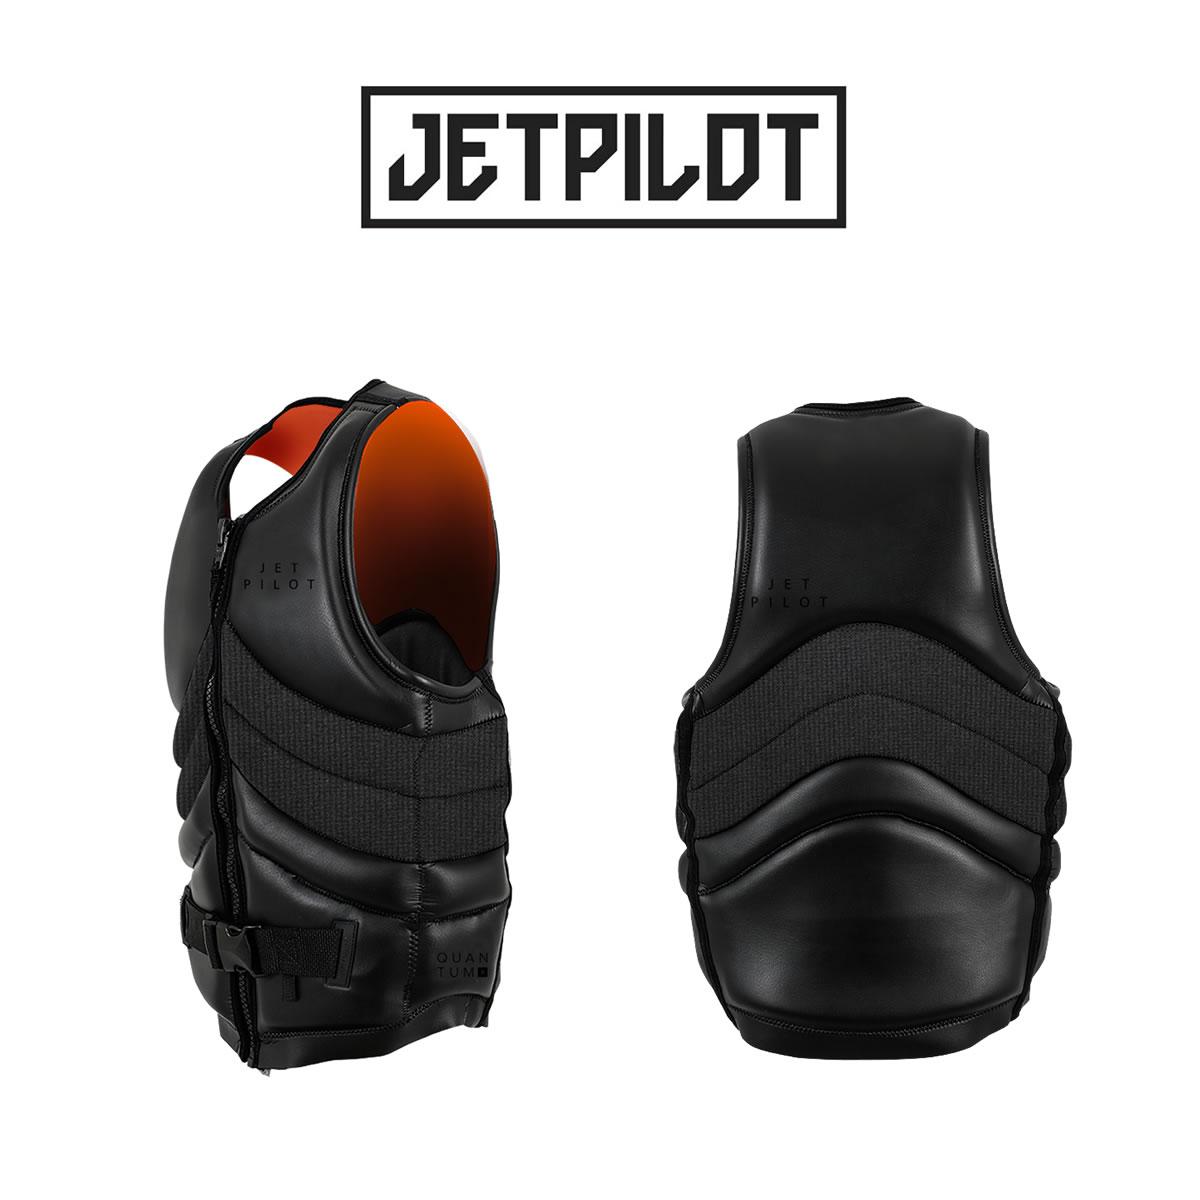 JETPILOT(ジェットパイロット)ネオベスト カンタム F/Eネオベスト(JA21306)